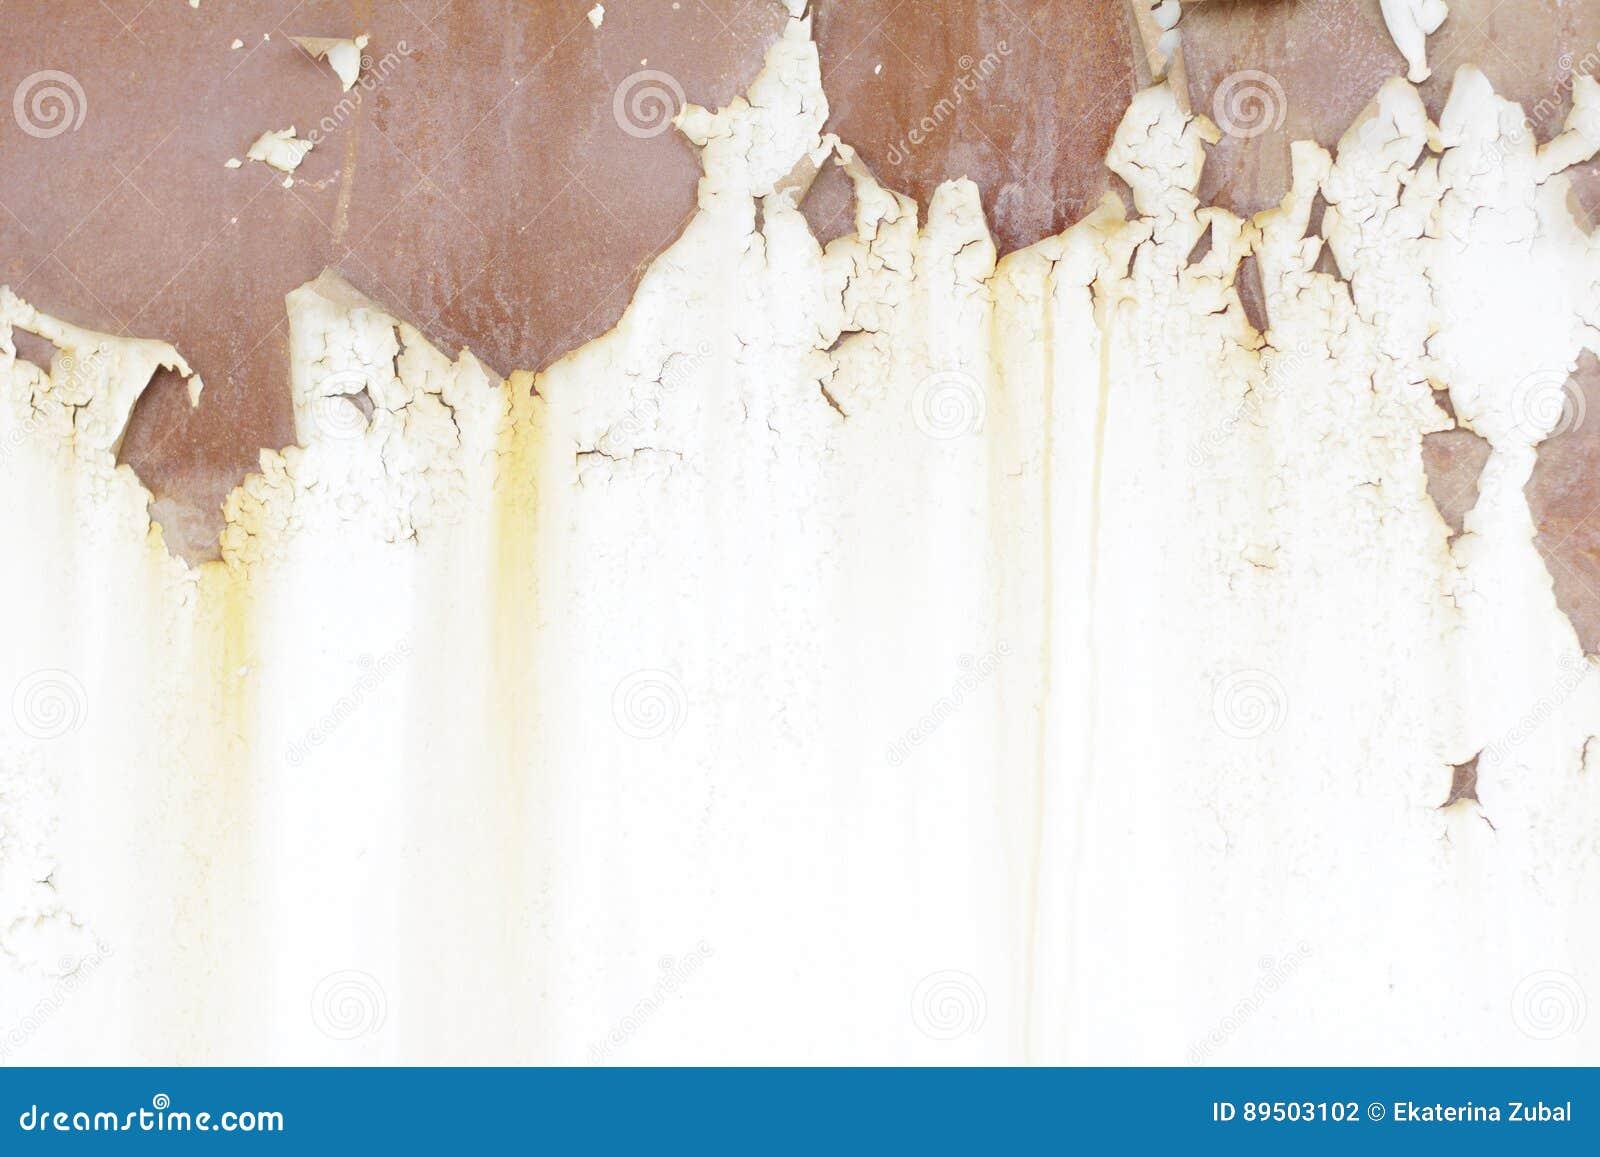 white garage door texture. Royalty-Free Stock Photo White Garage Door Texture R